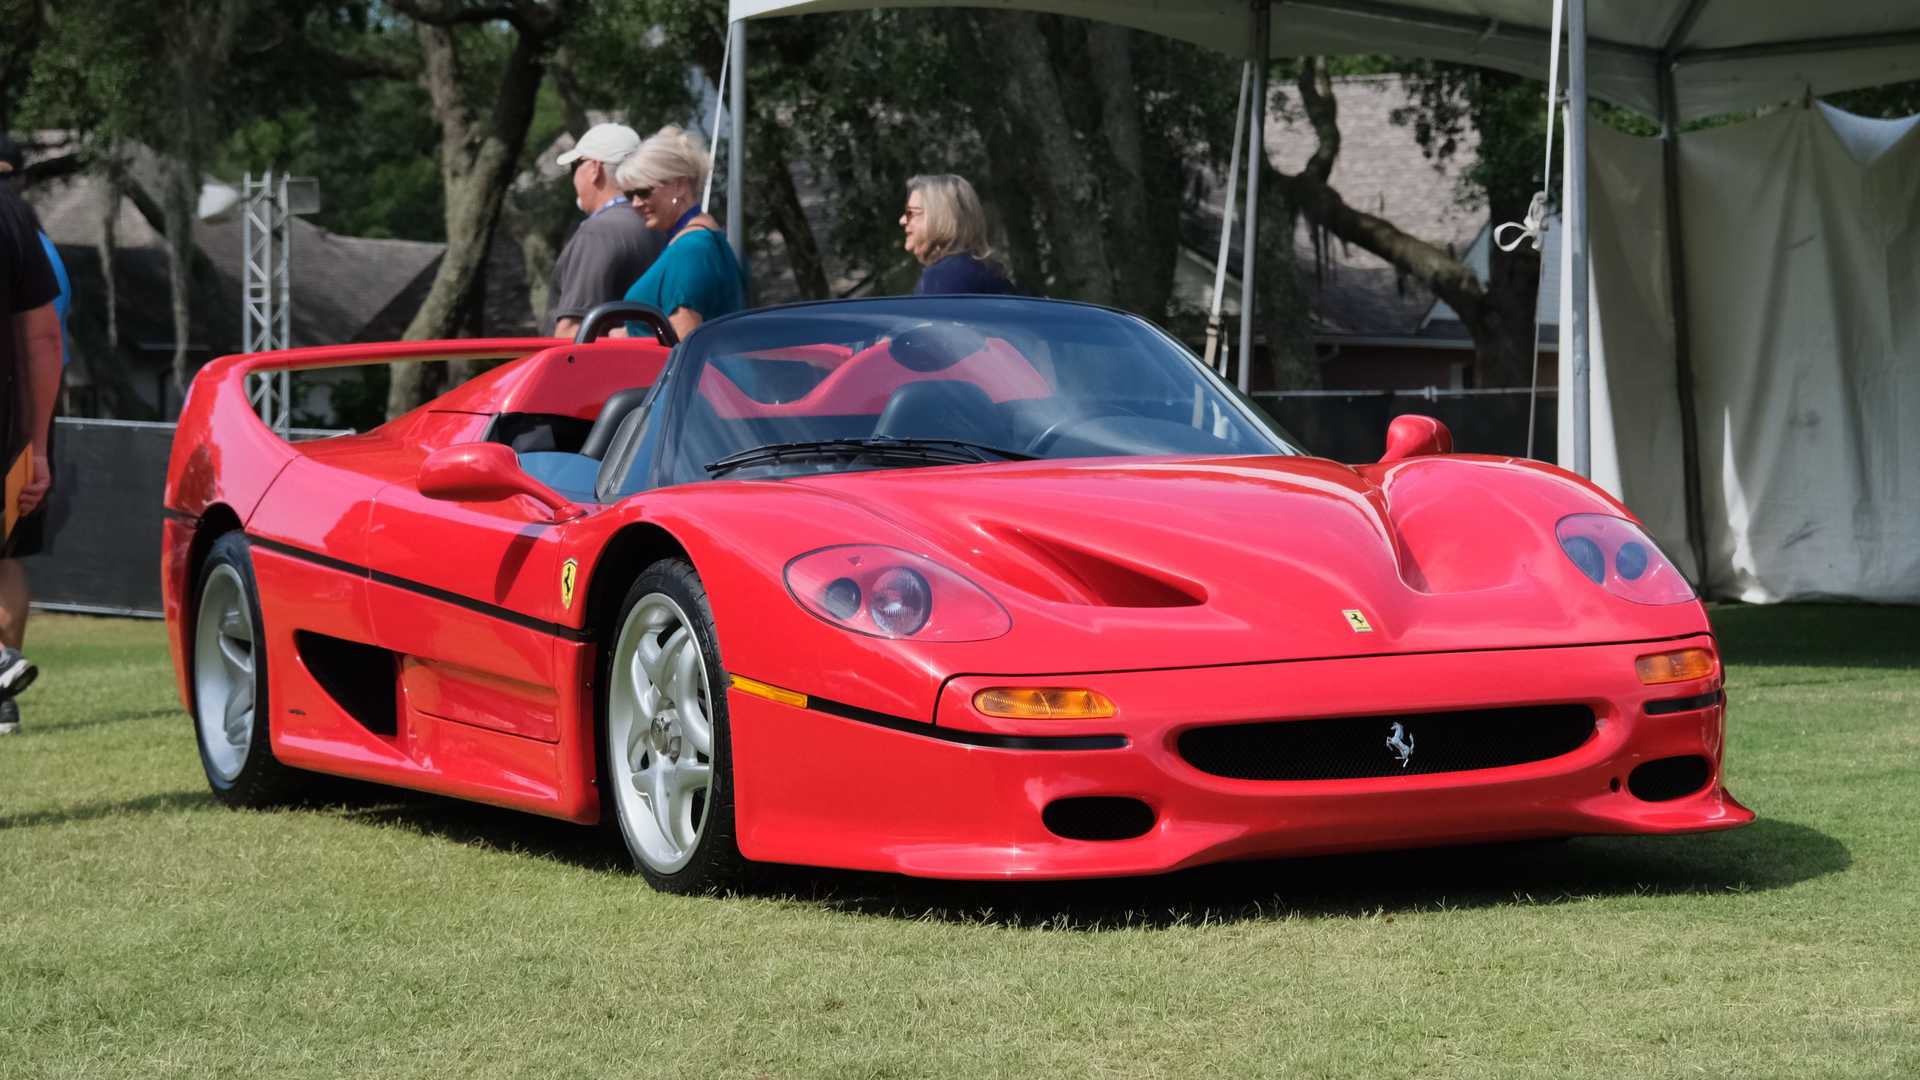 1995 Ferrari F50 At Amelia Island Concours d'Elegance